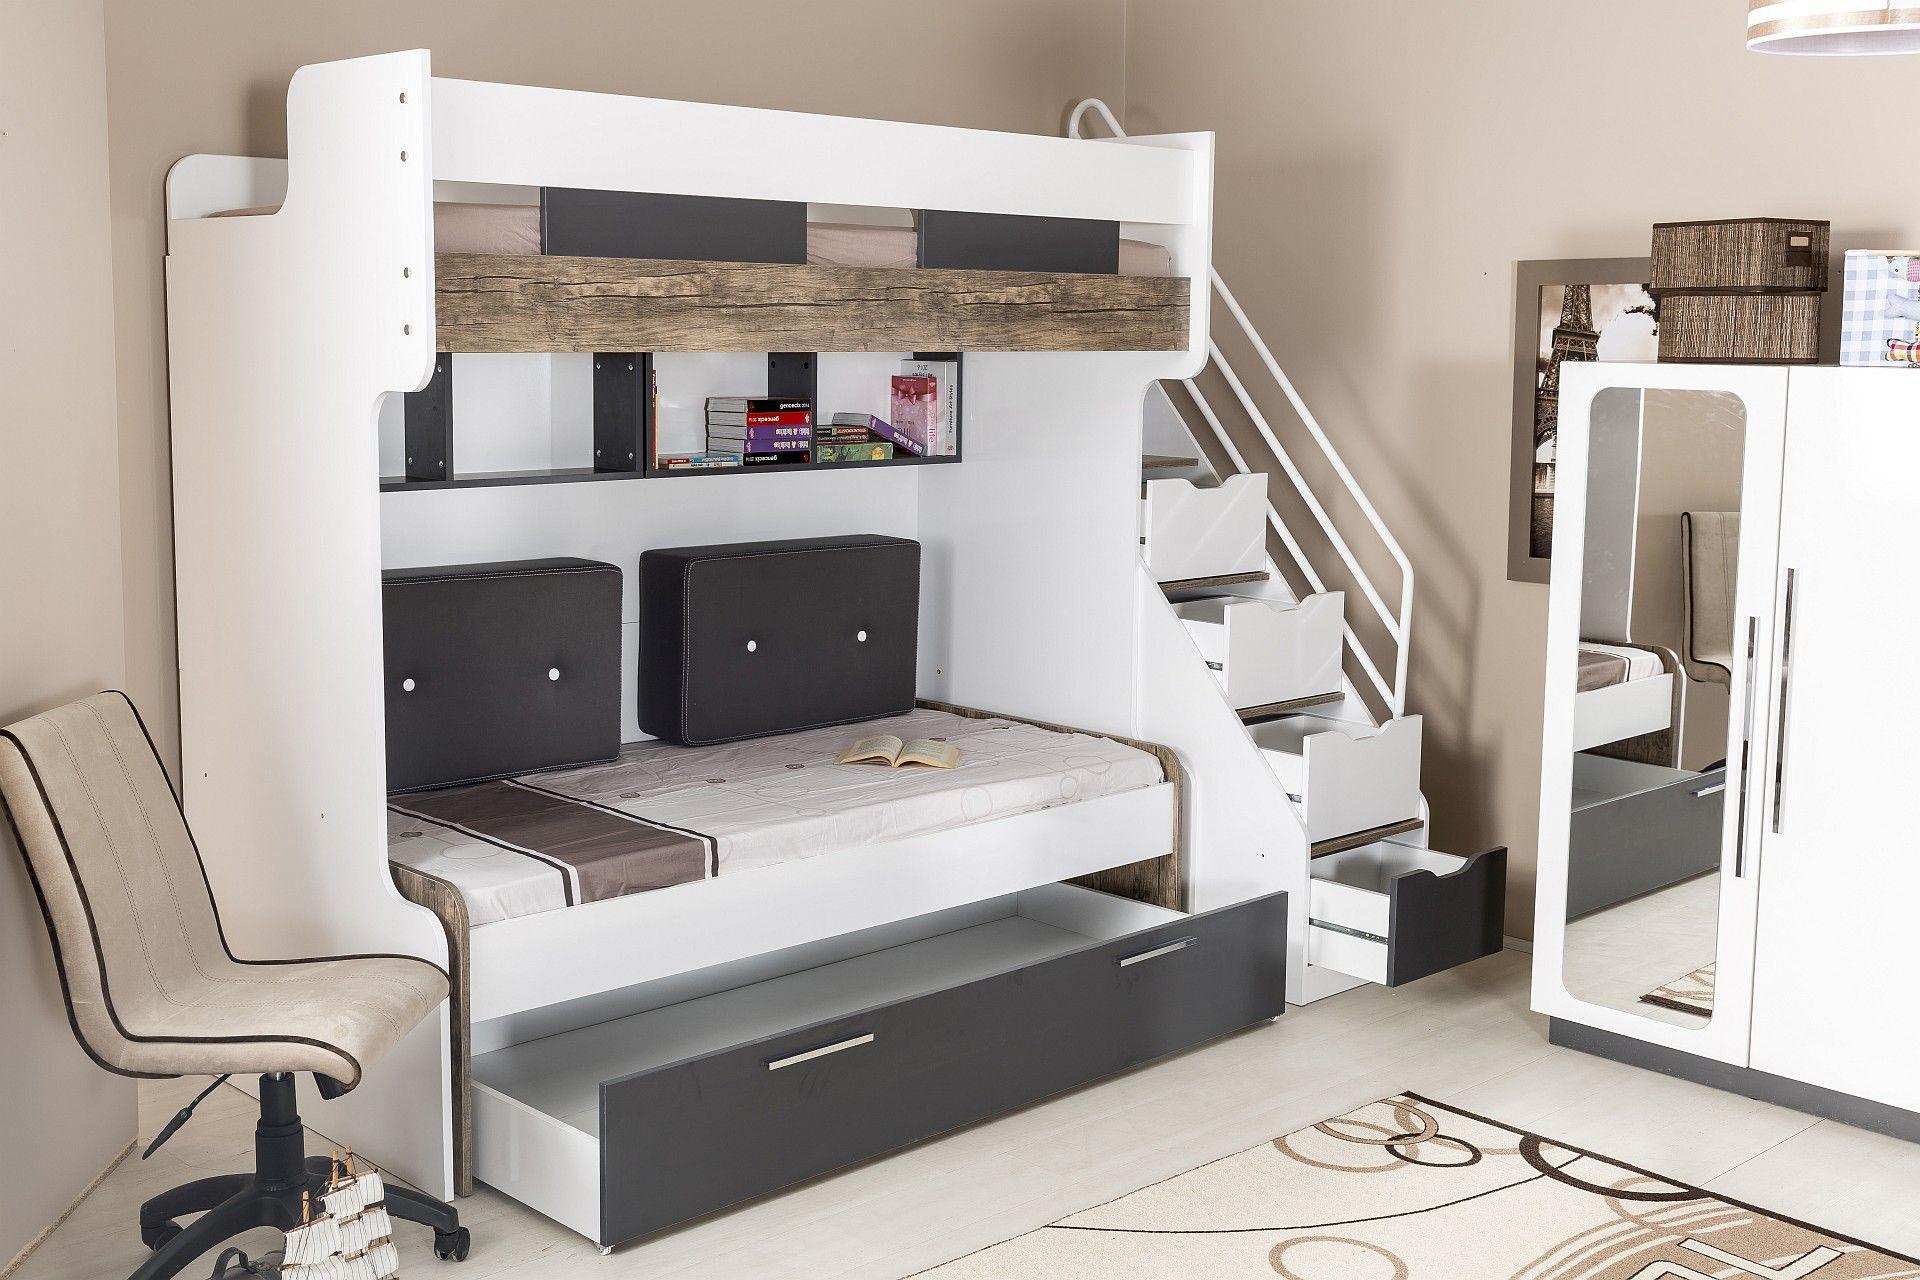 Hochbett Compact 90x200 cm 5teilig, weiß Kinderbed